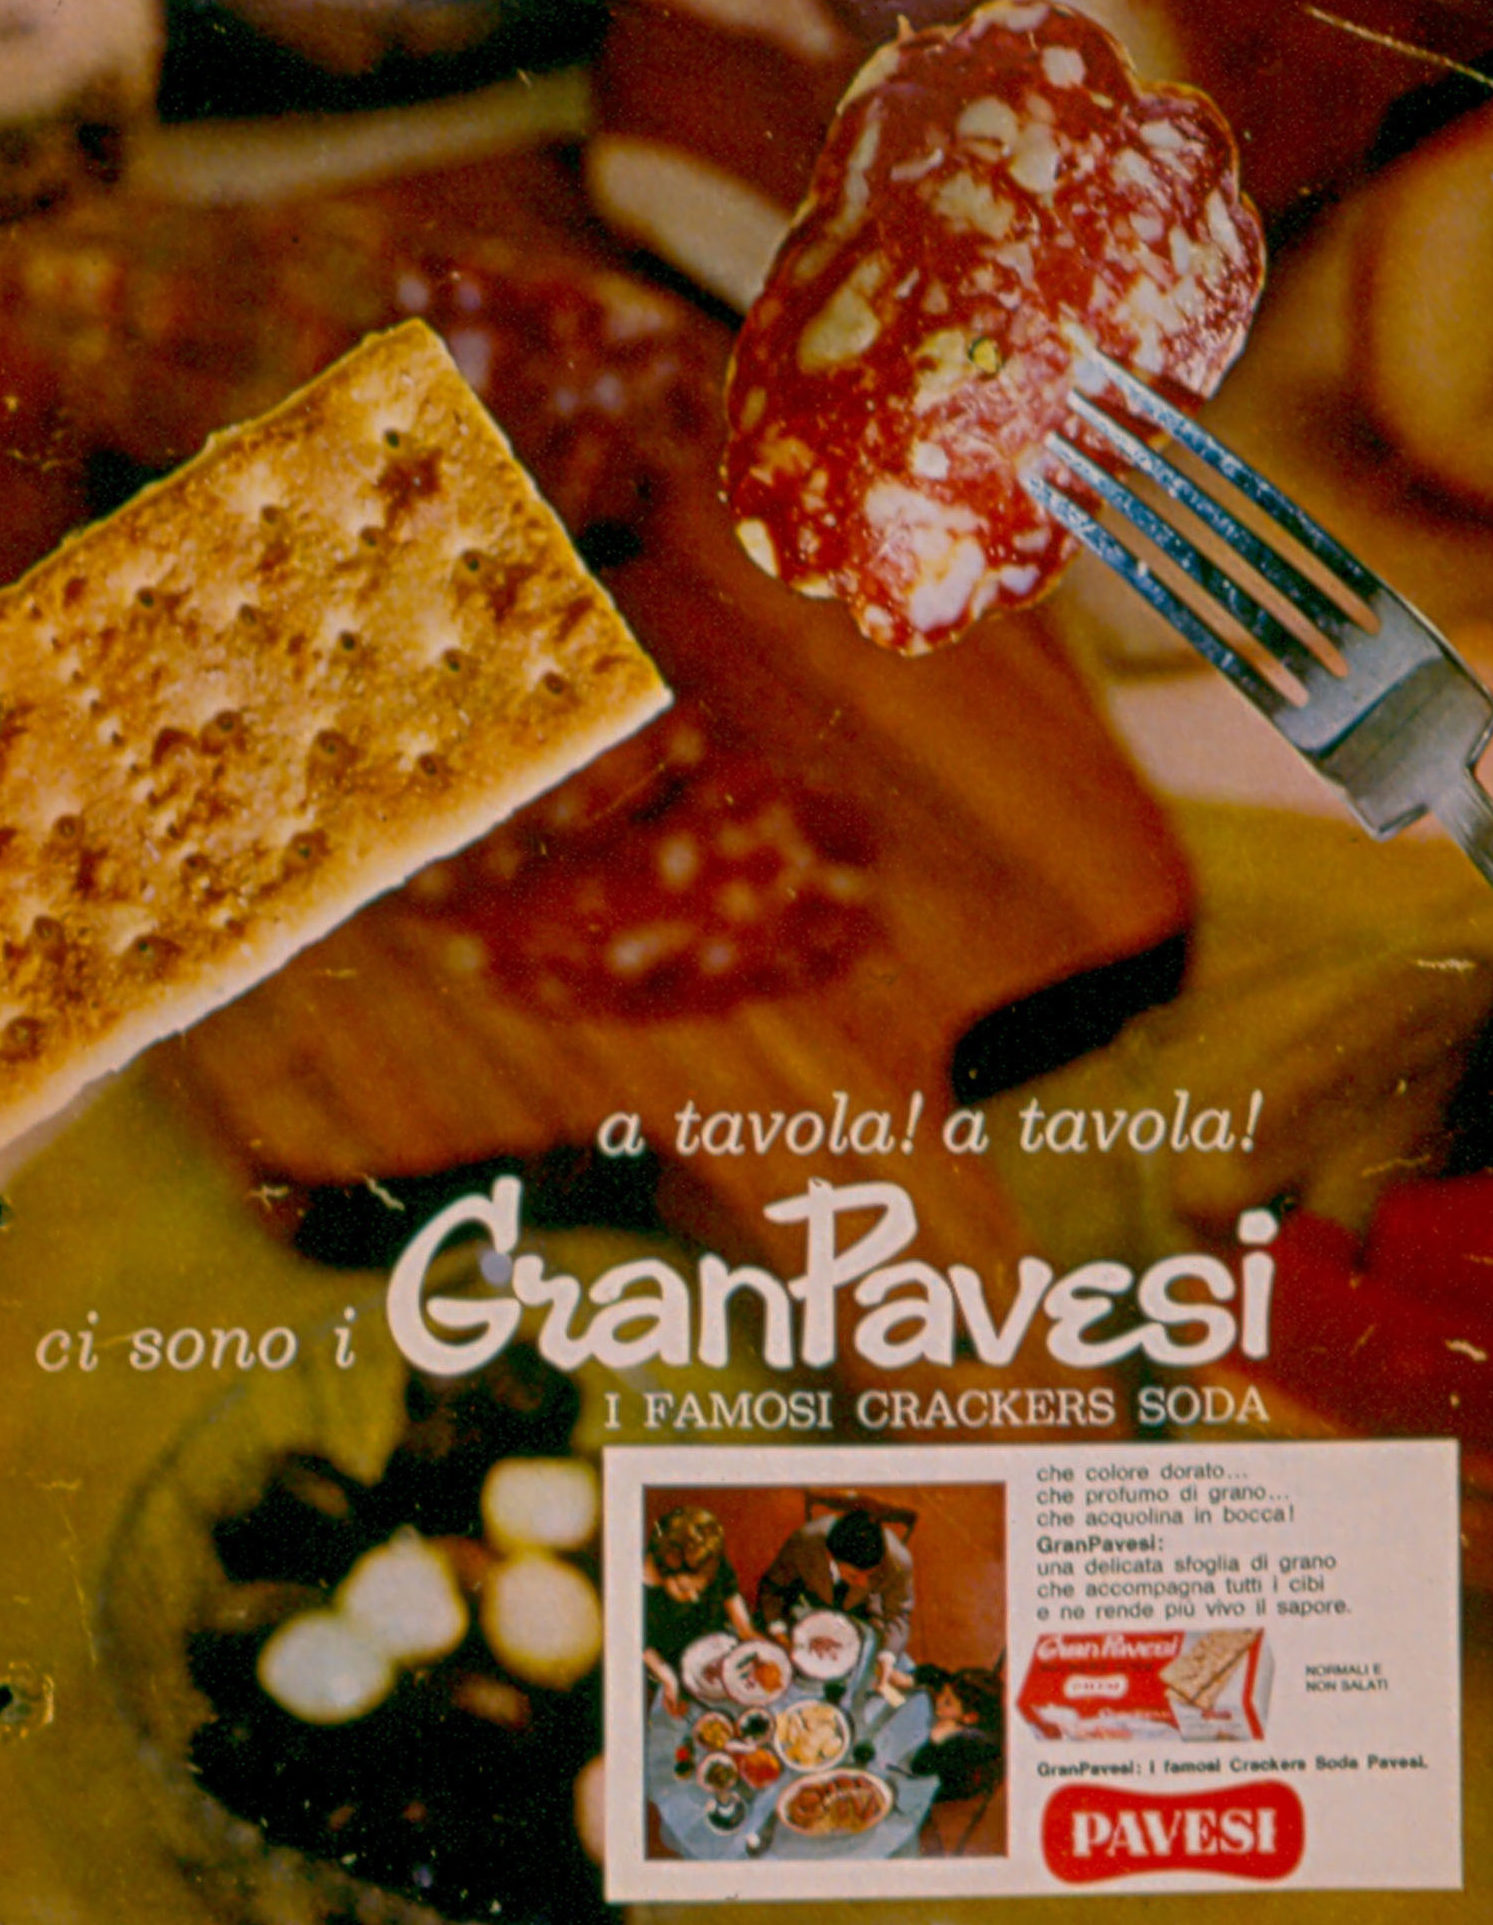 Press advertising Gran Pavesi Crackers, 1964